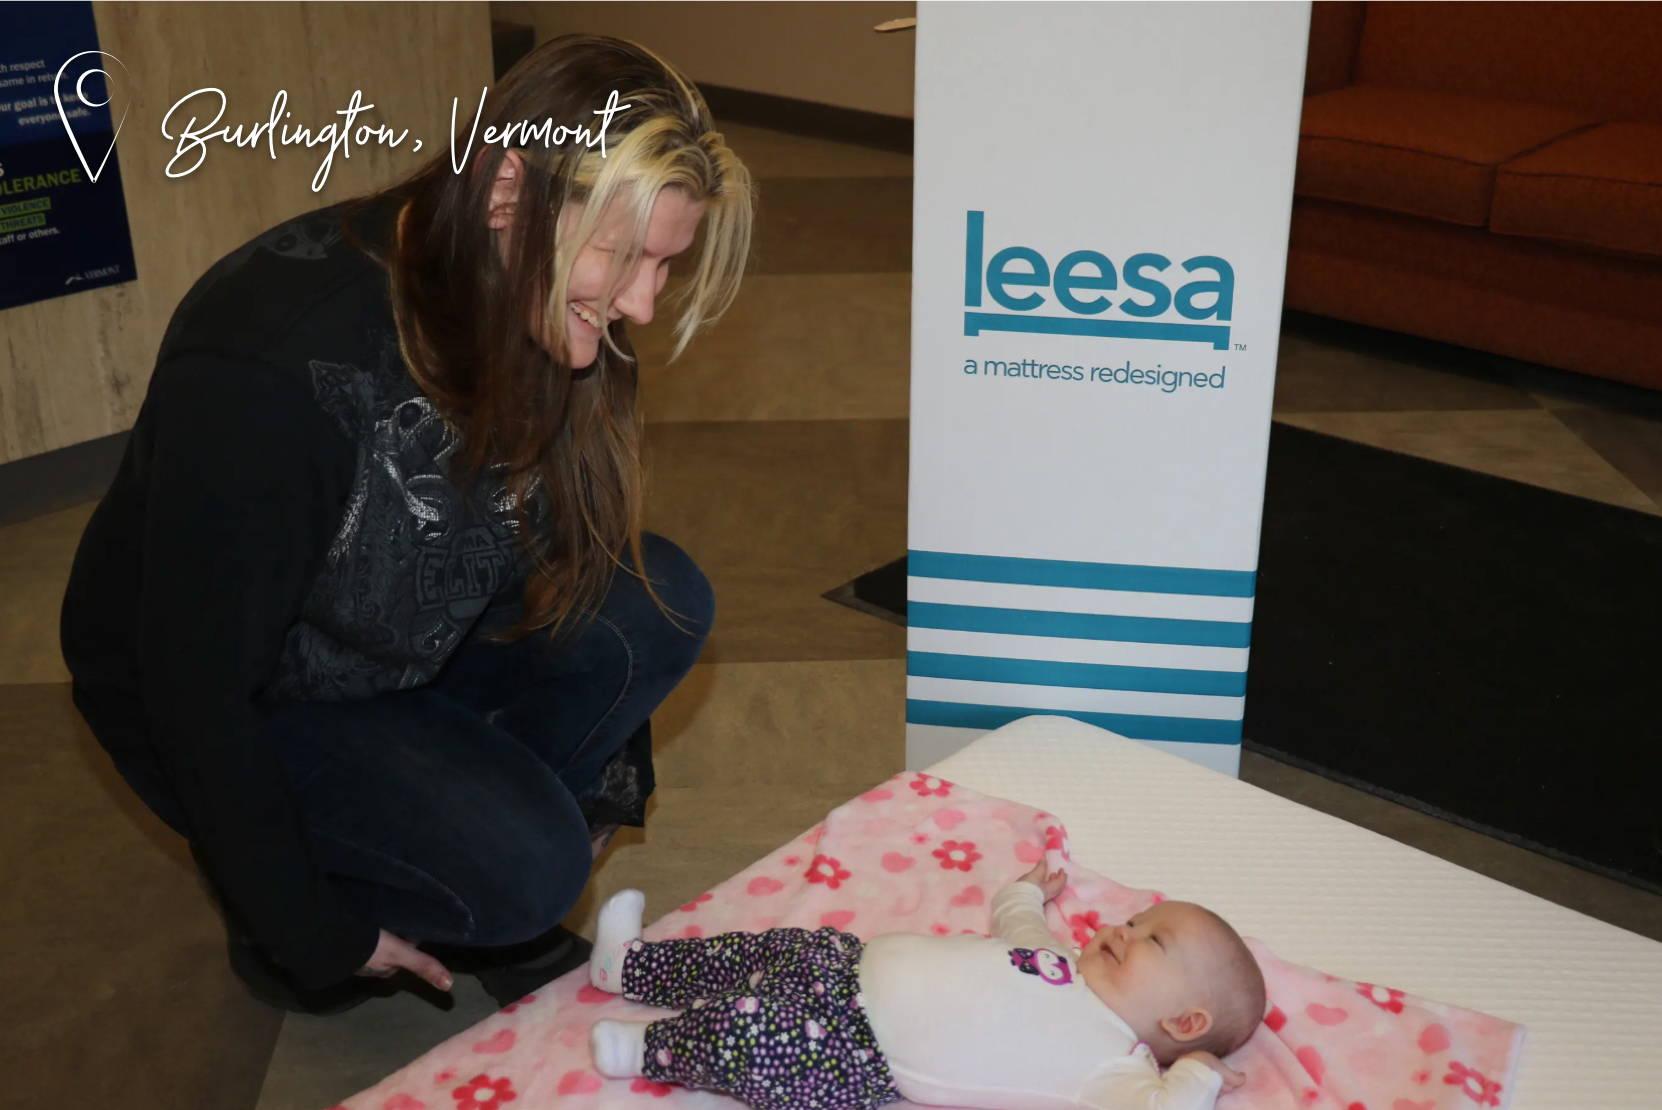 Burlington, Vermont, women leaning over baby laying on Leesa mattress